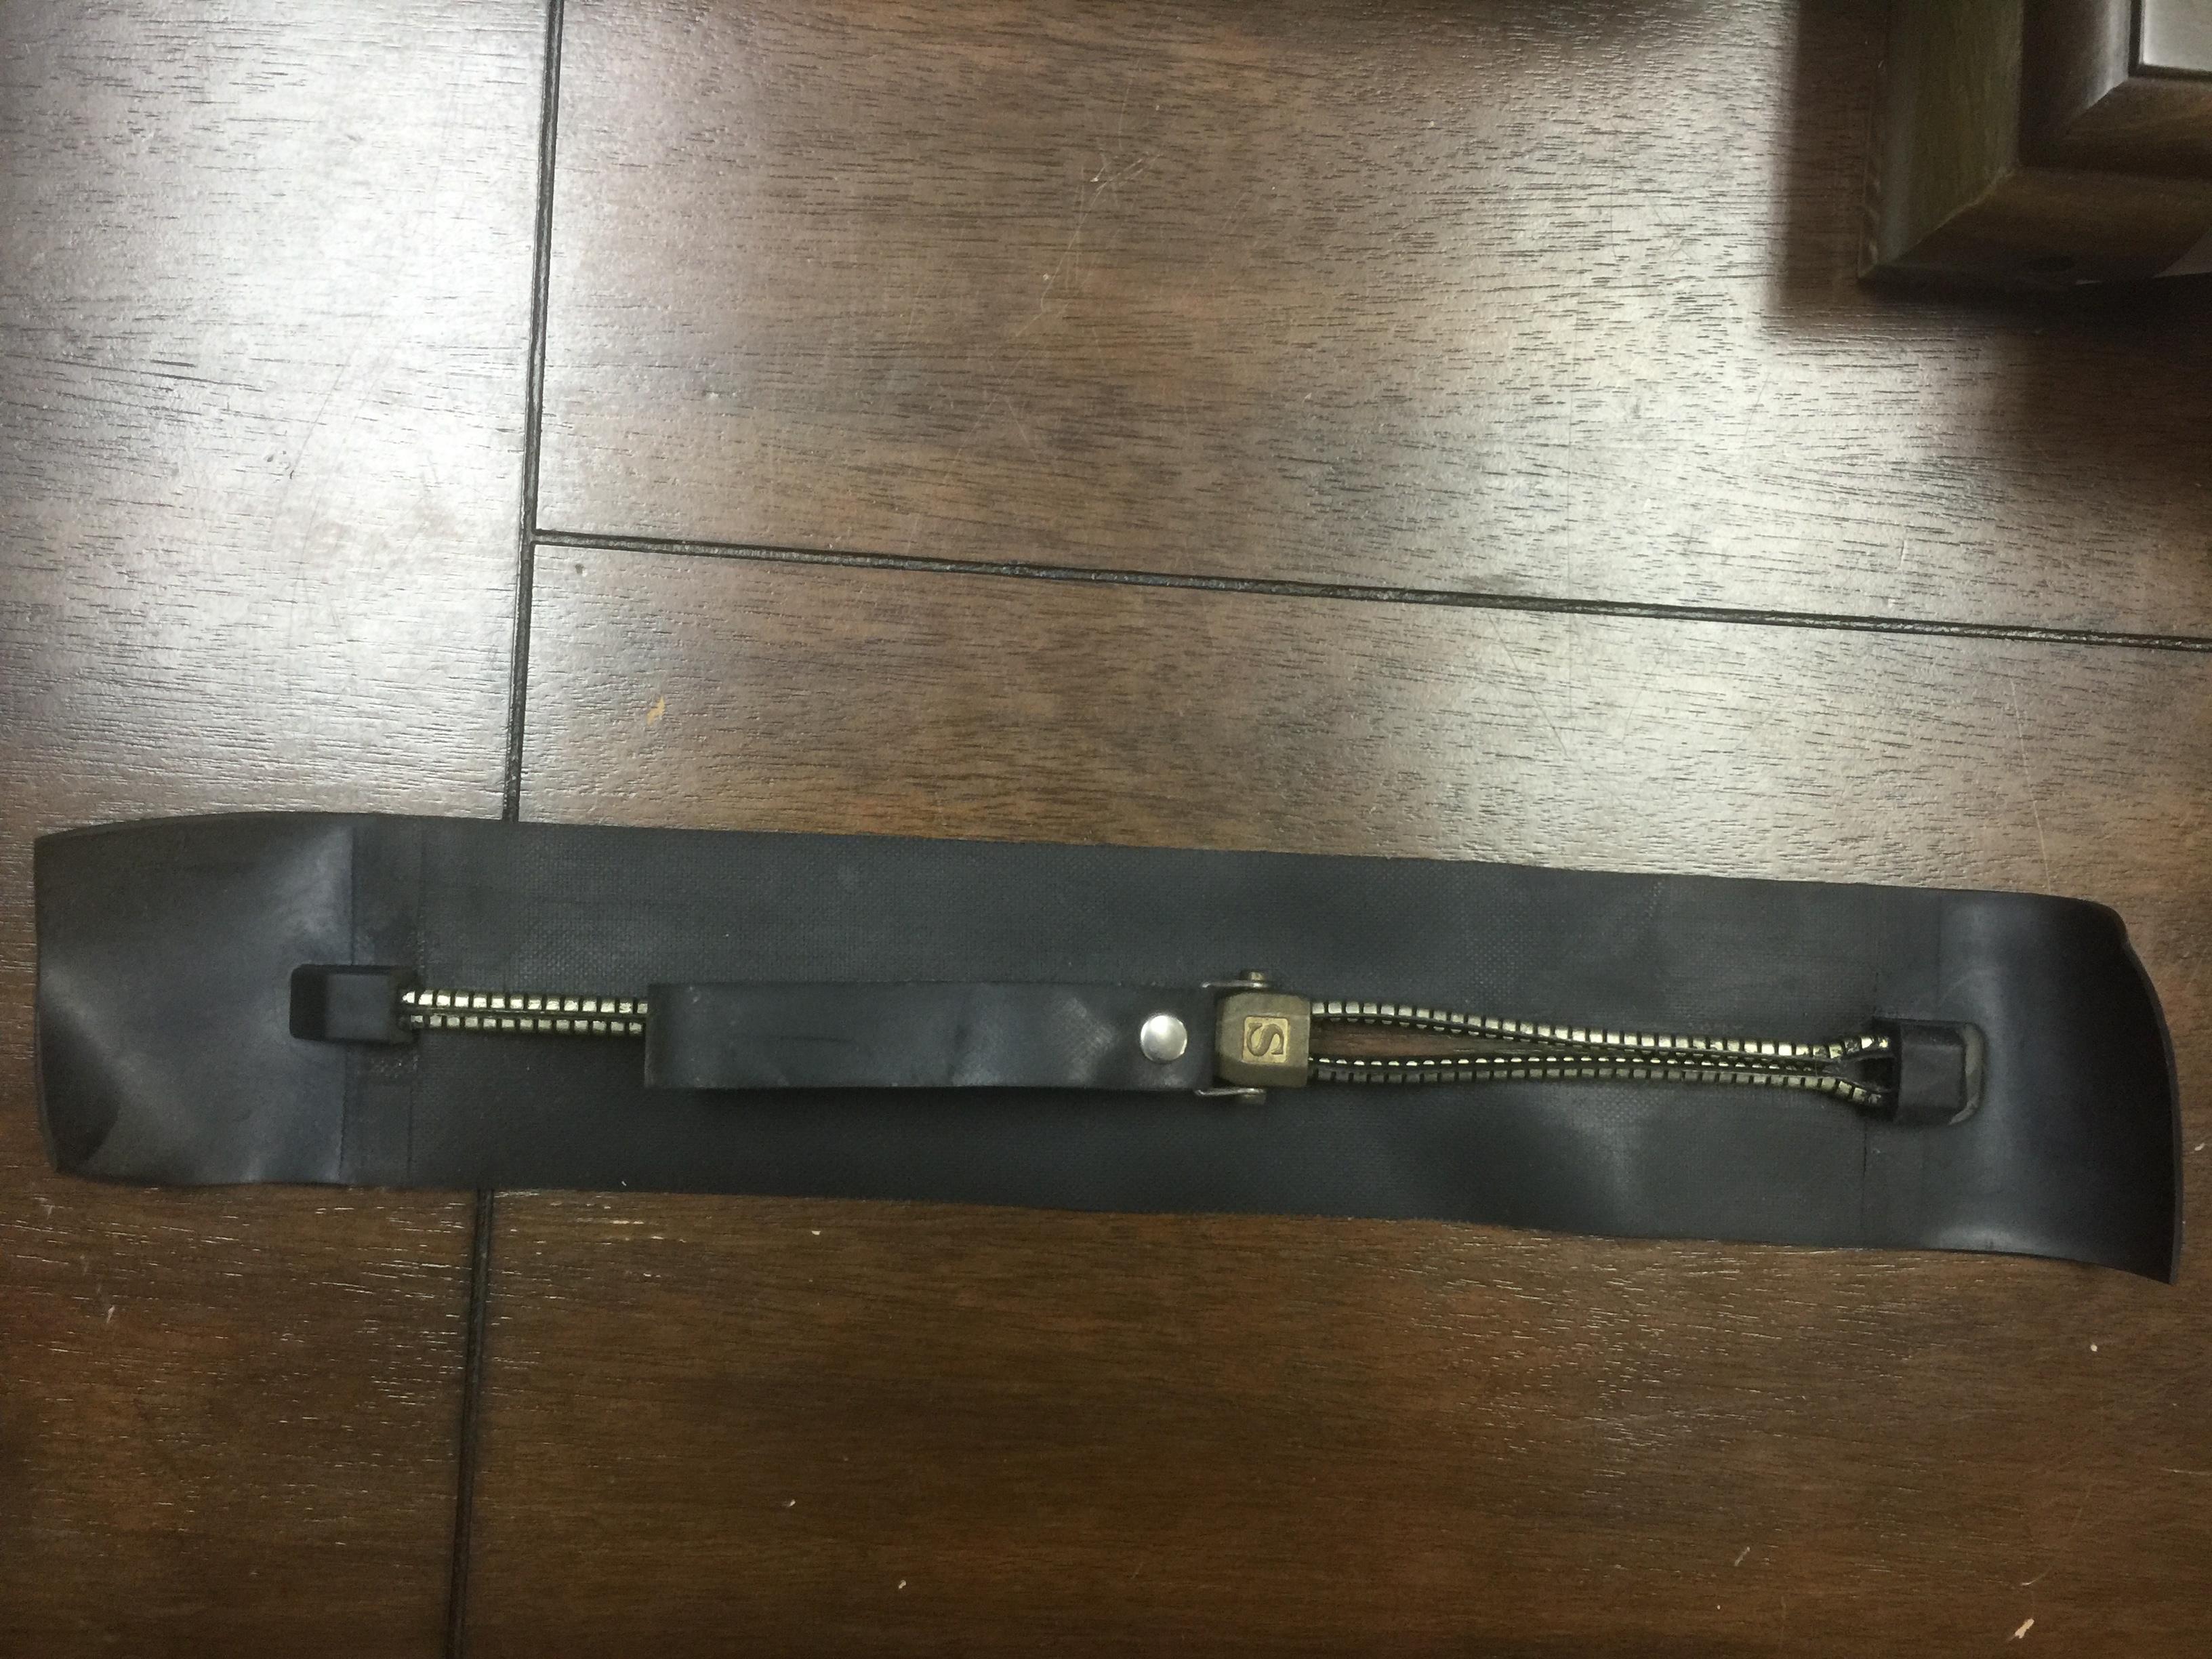 Watertight Zipper, Airtight Zippers for Diving Suits